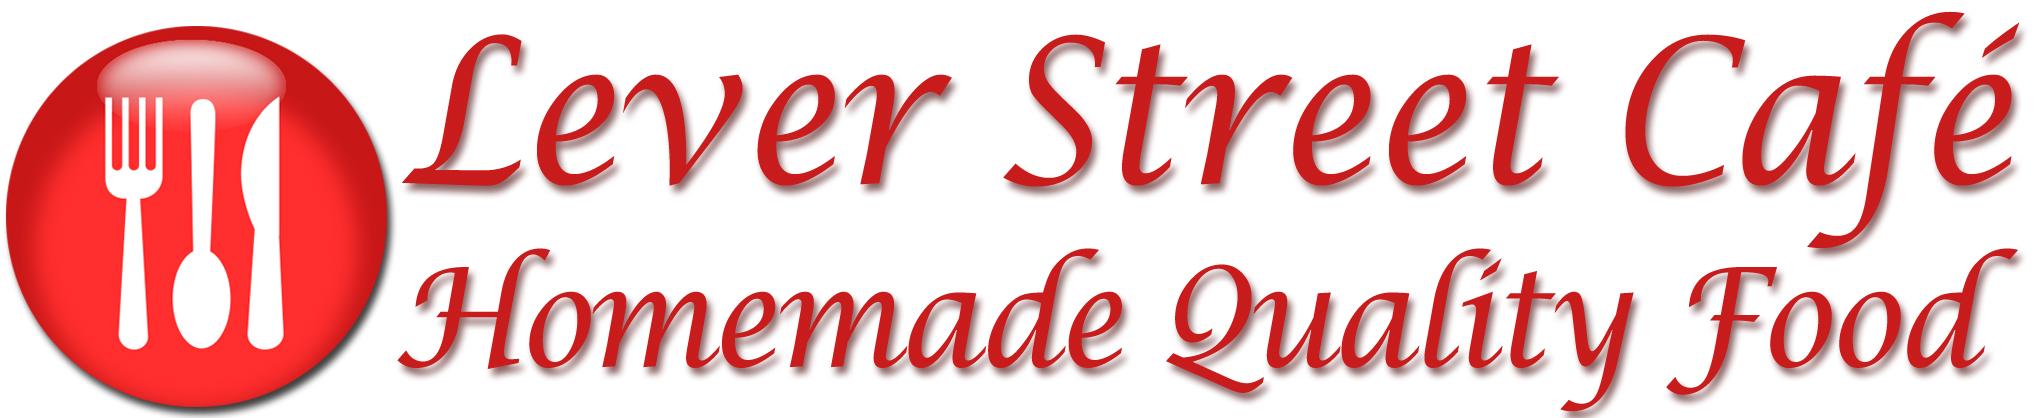 Lever Street Cafe - Quality Homemade Food